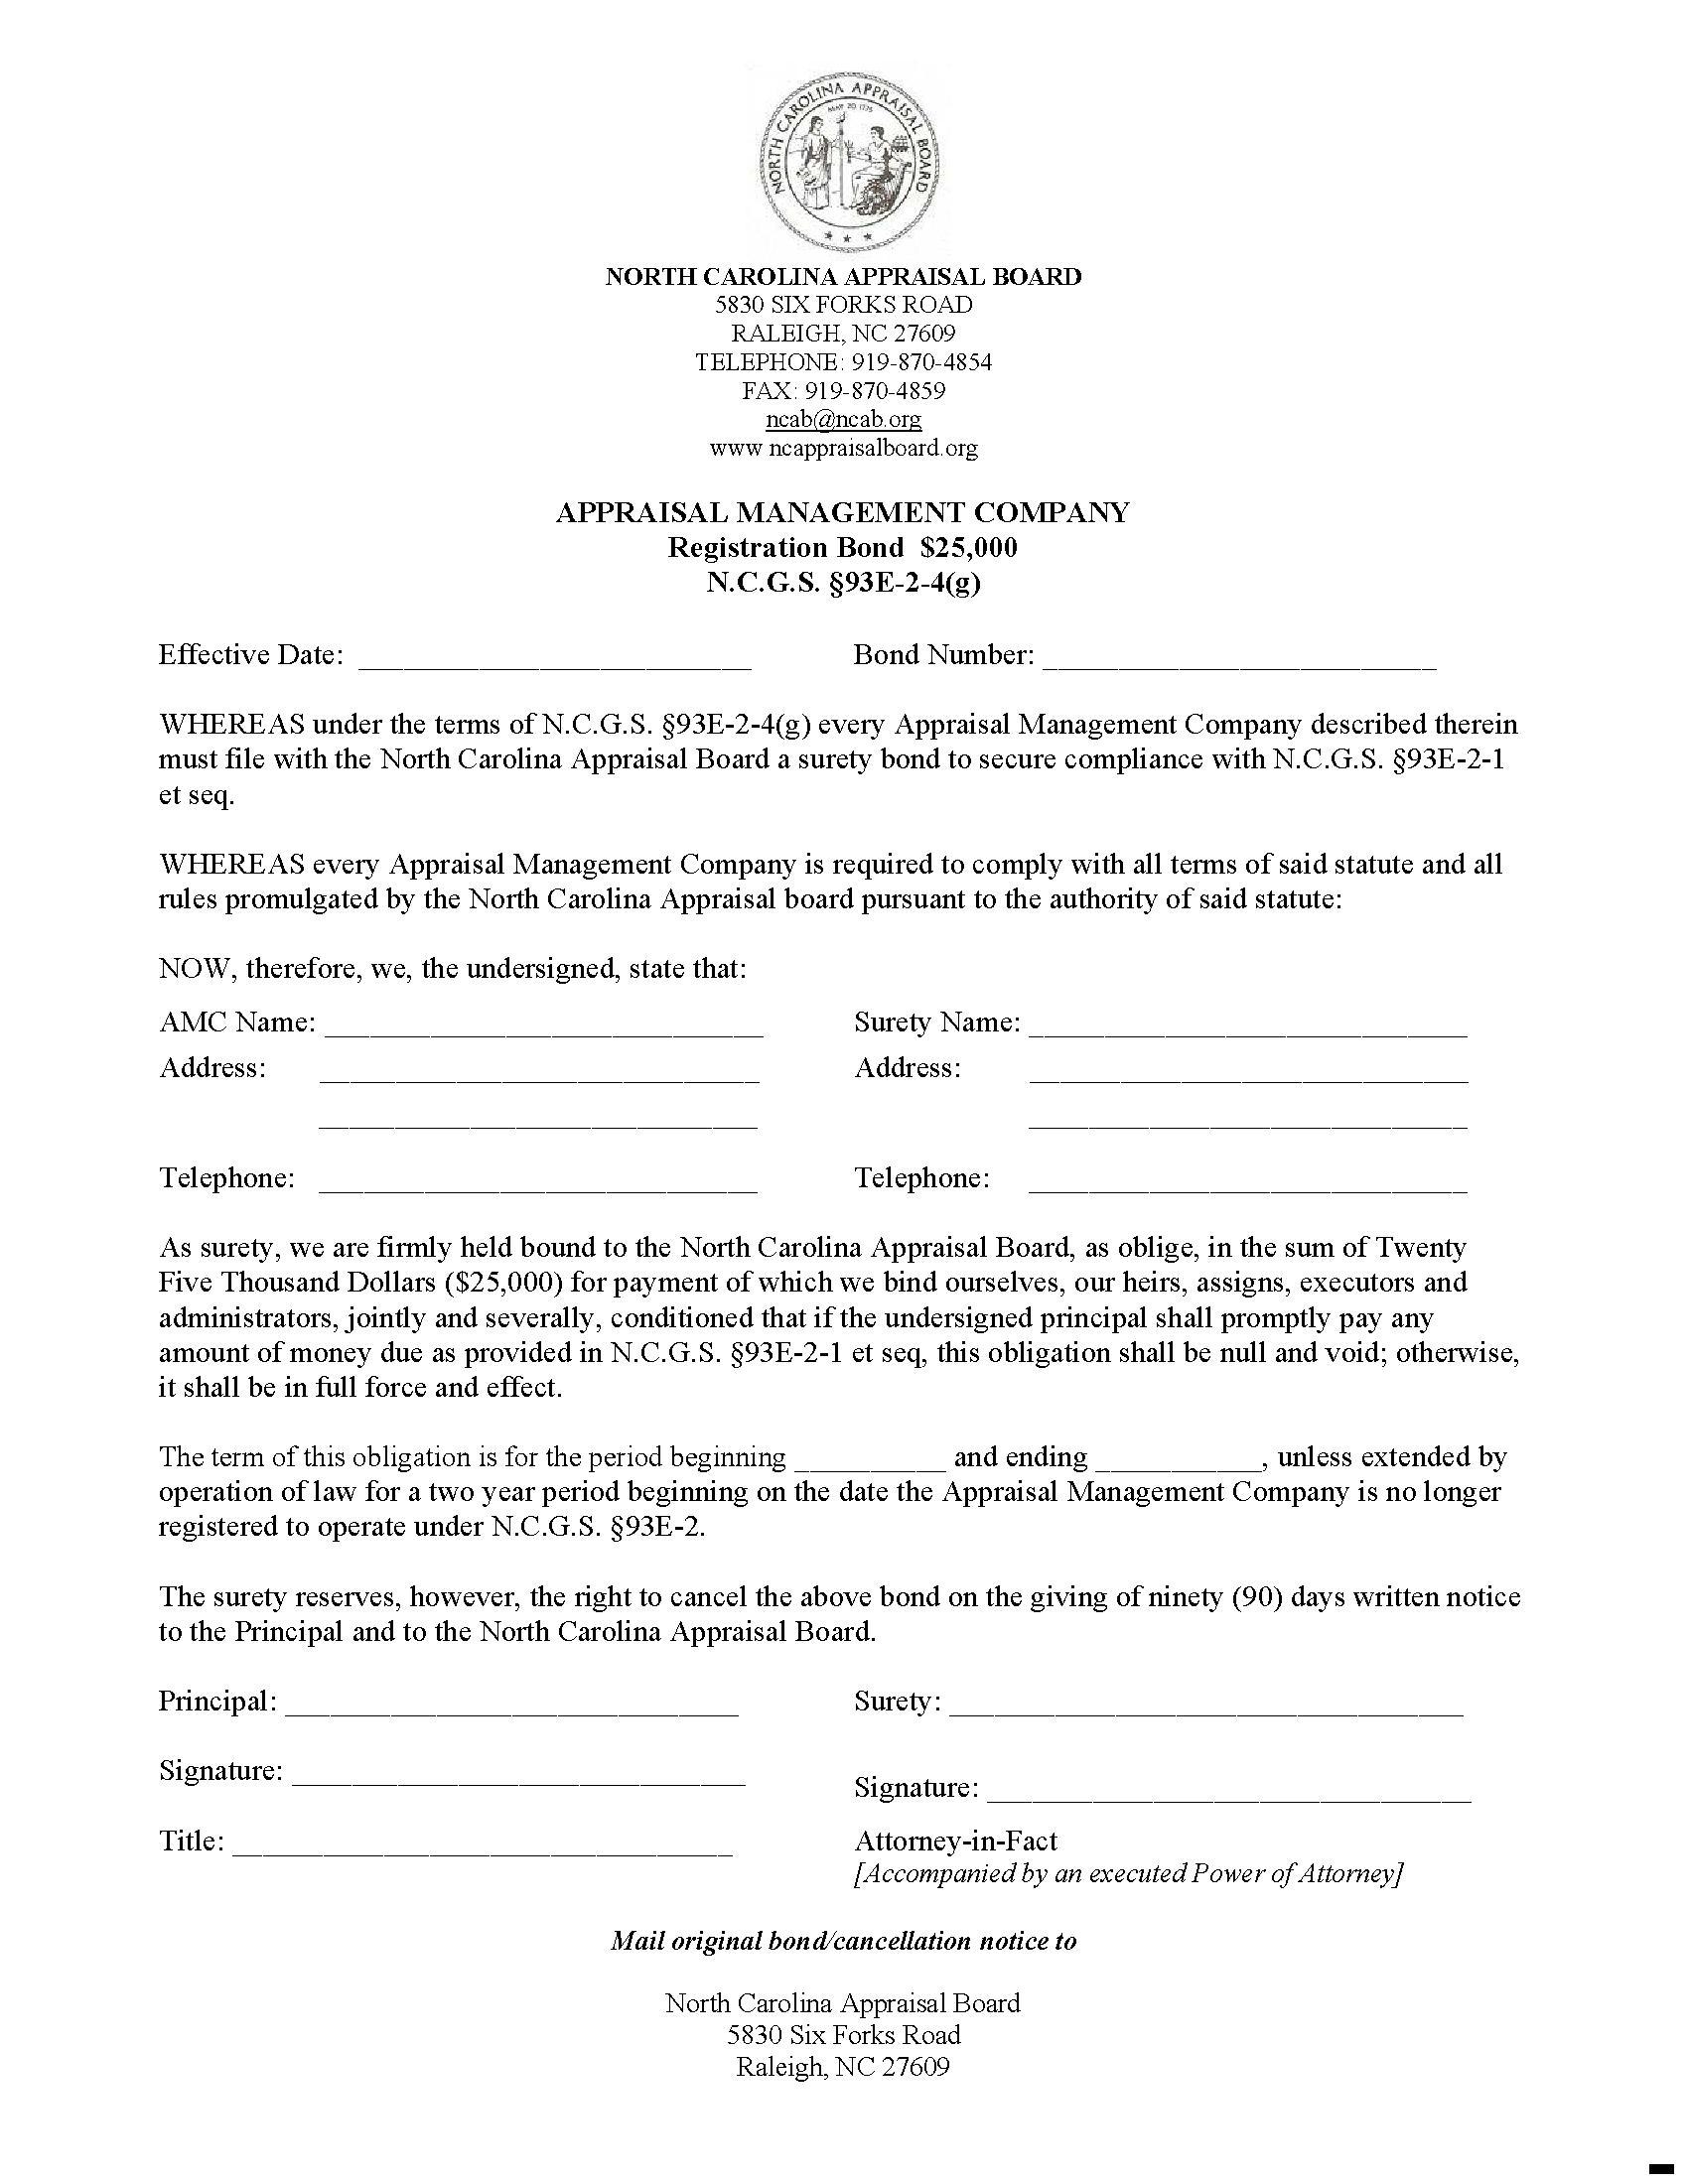 State of North Carolina Appraisal Management Company sample image